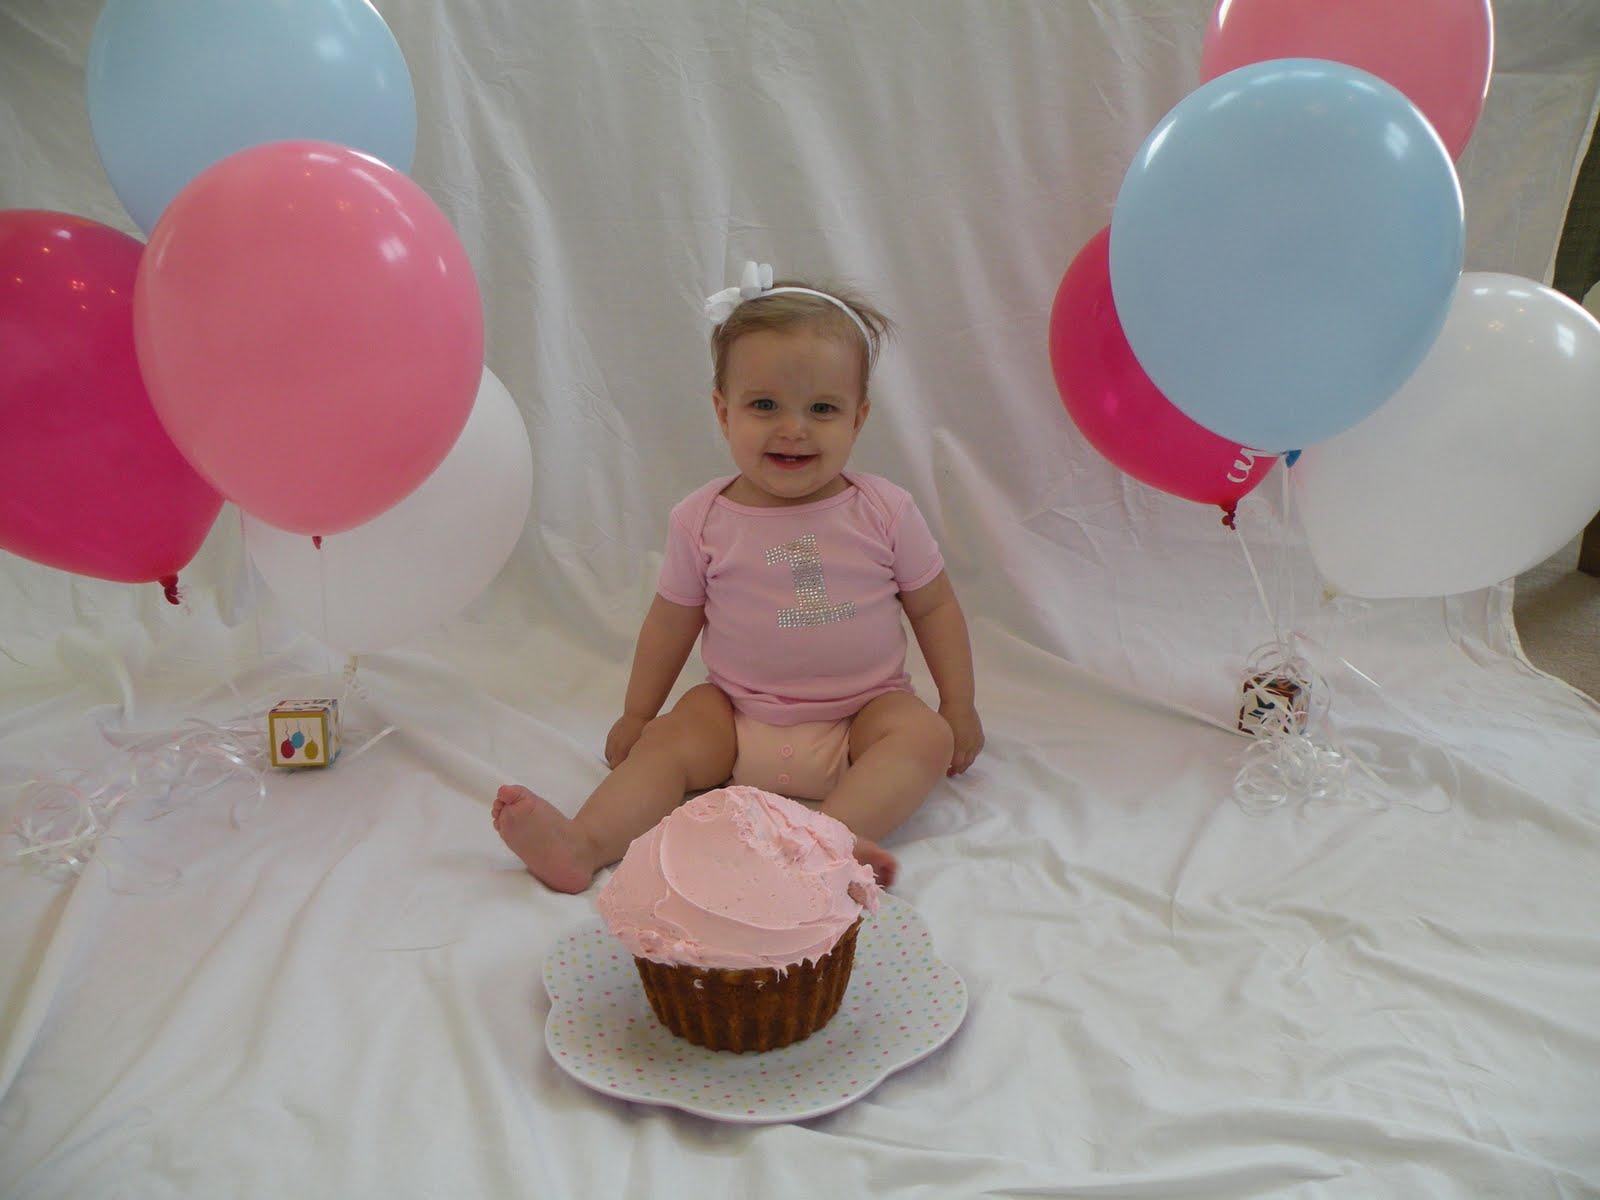 Baby's 1st birthday cake smash - Thriving Parents